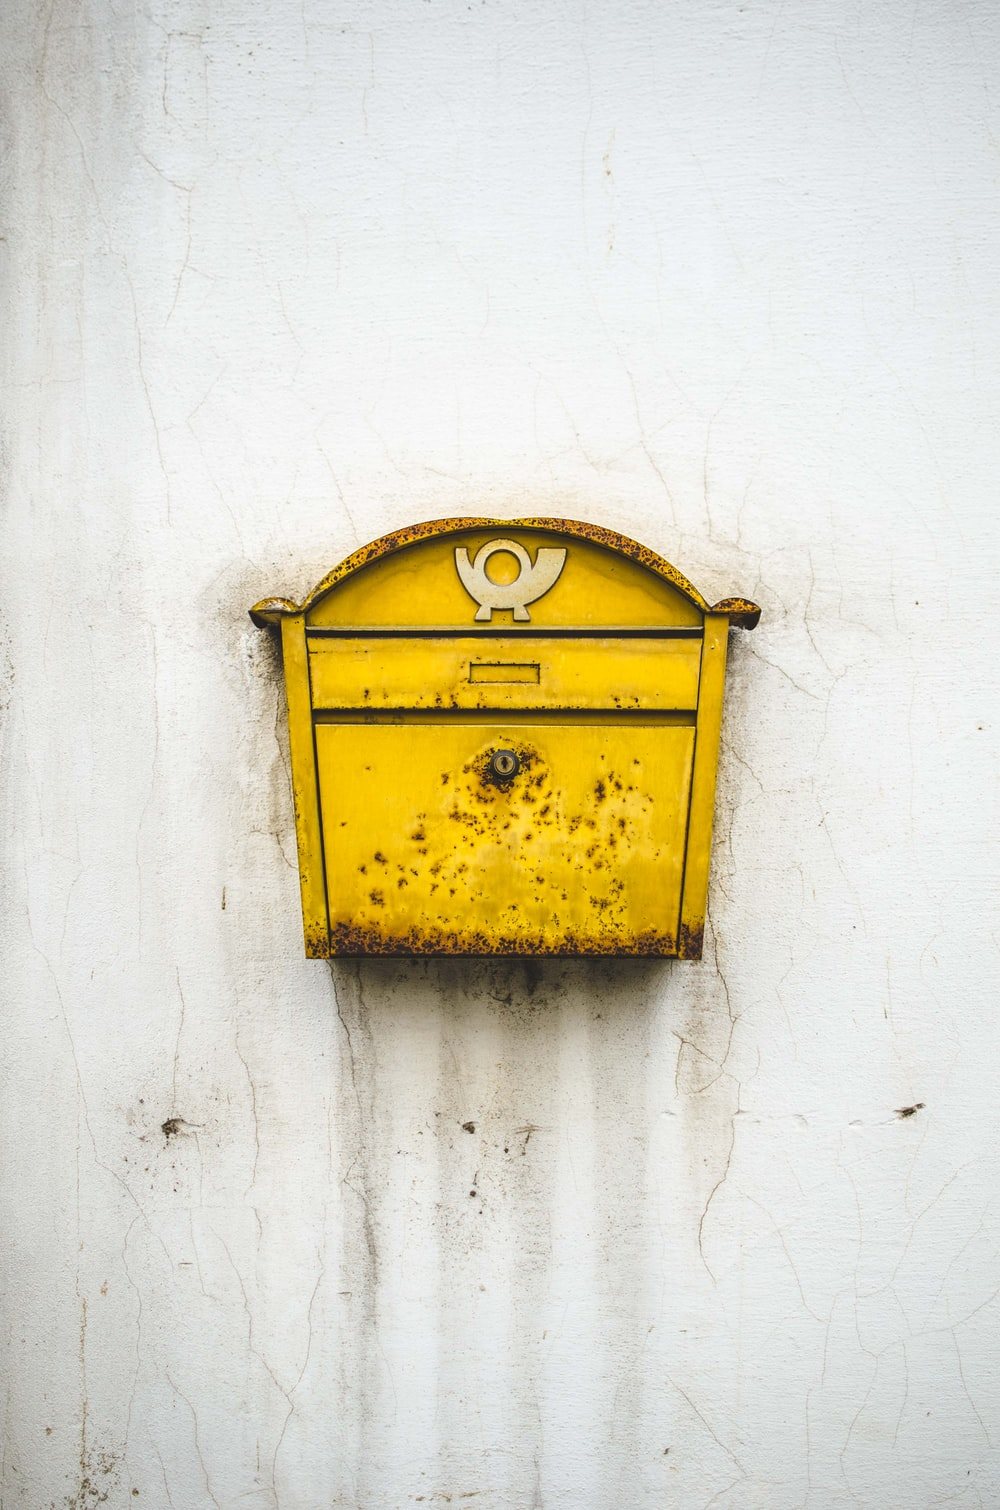 brass-colored mailbox